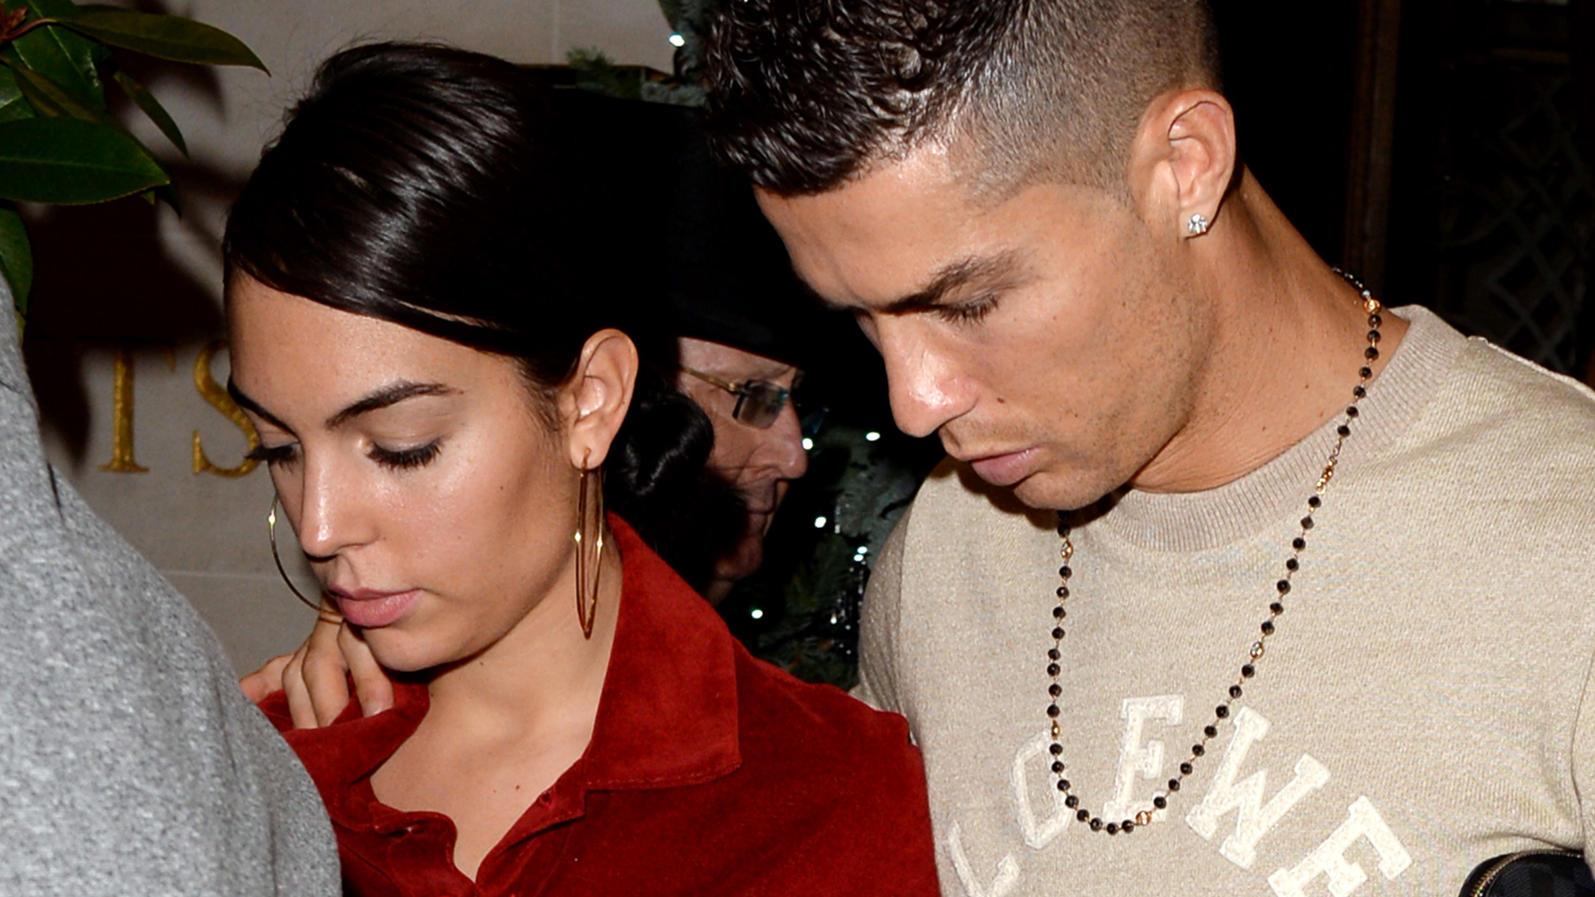 Cristiano Ronaldo gibt in Londoner Bar in 15 Minuten 31.000 Euro aus